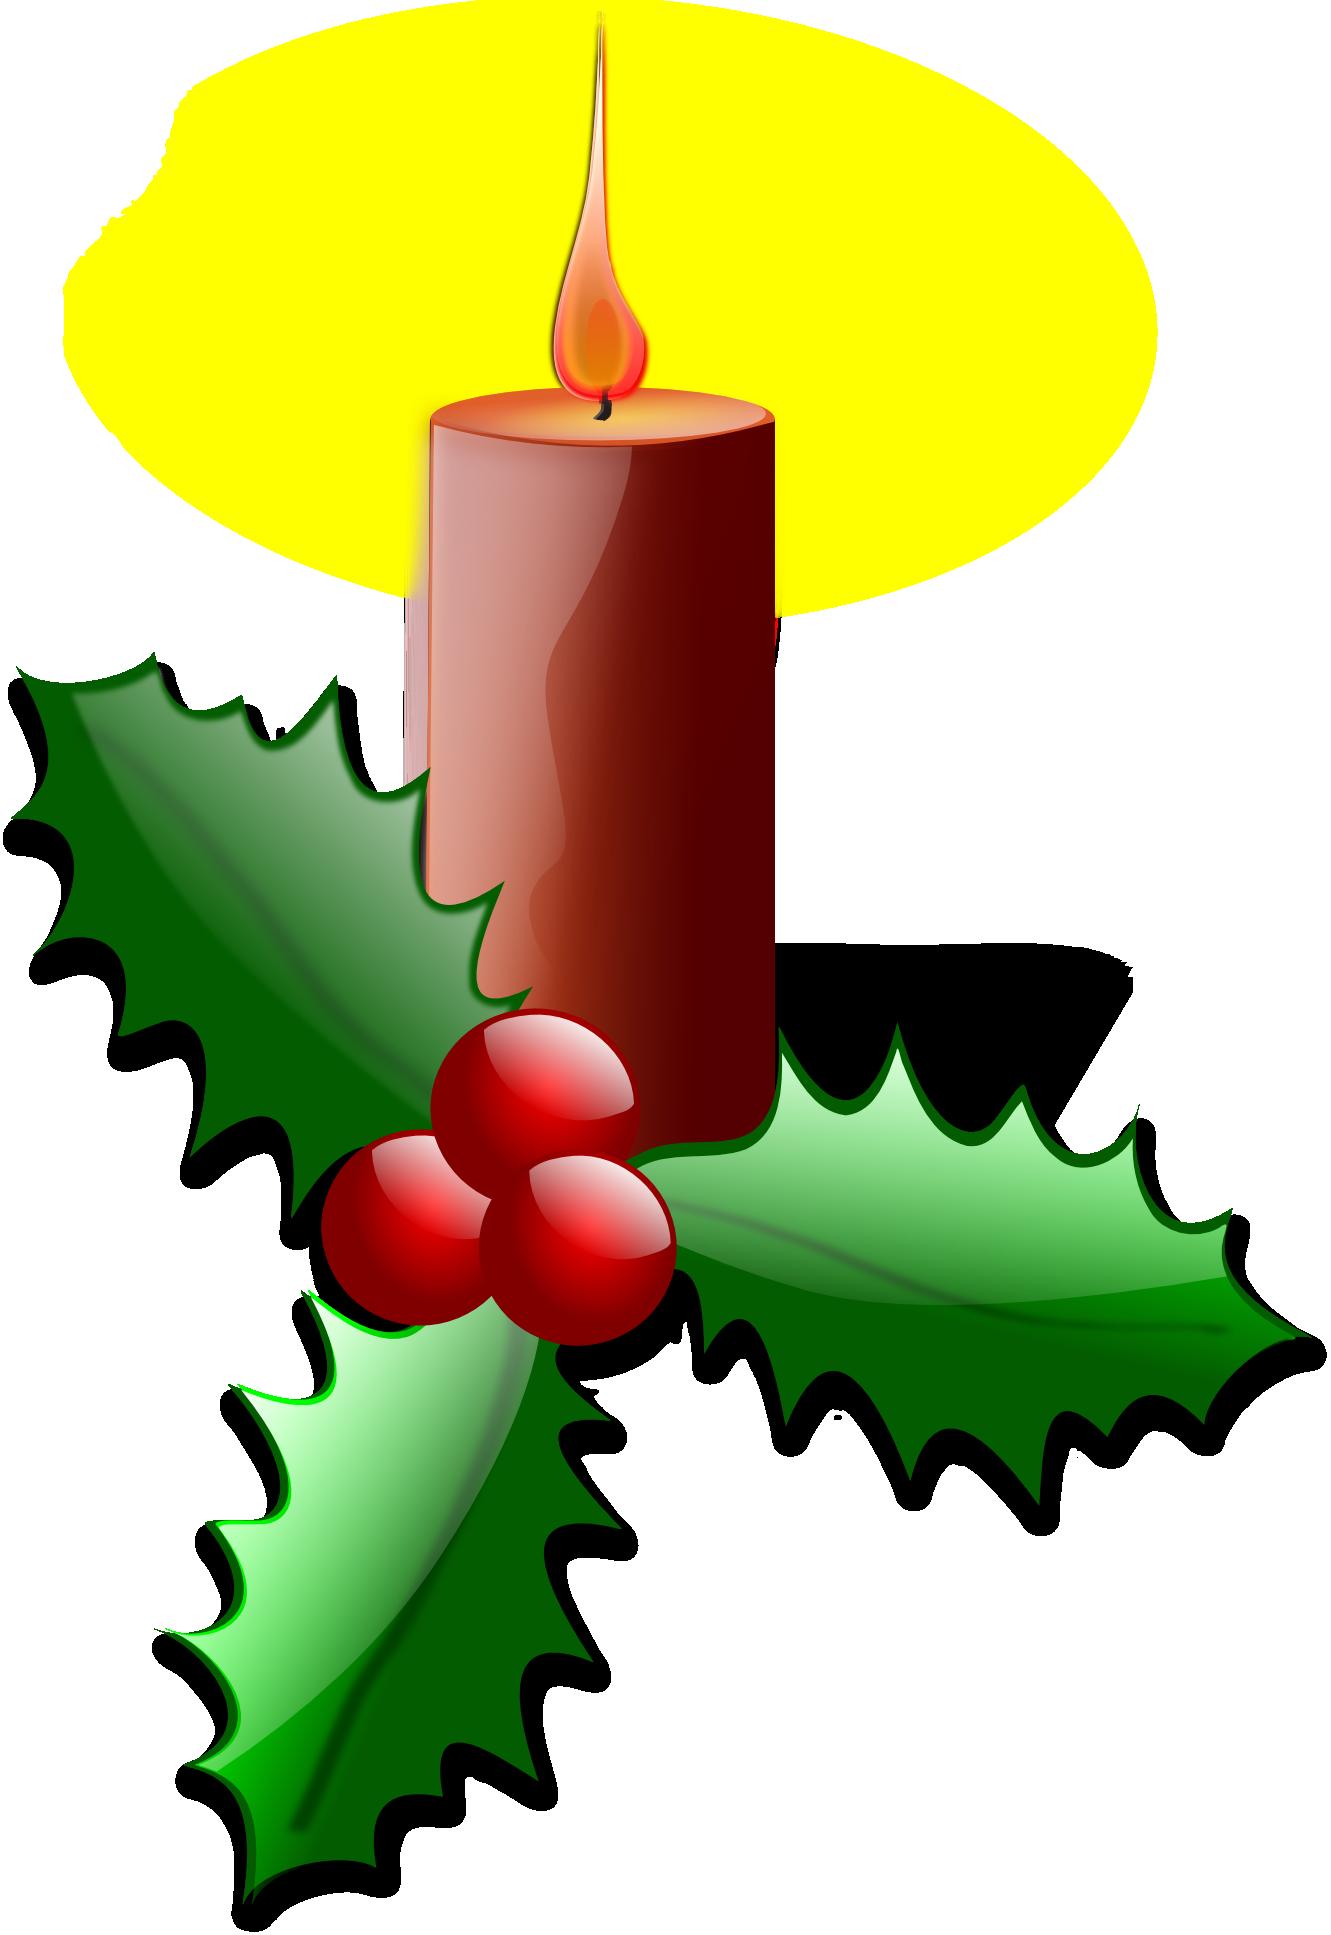 1331x1935 Xmas Stuff For Christmas Holly Bells Clip Art Xmas